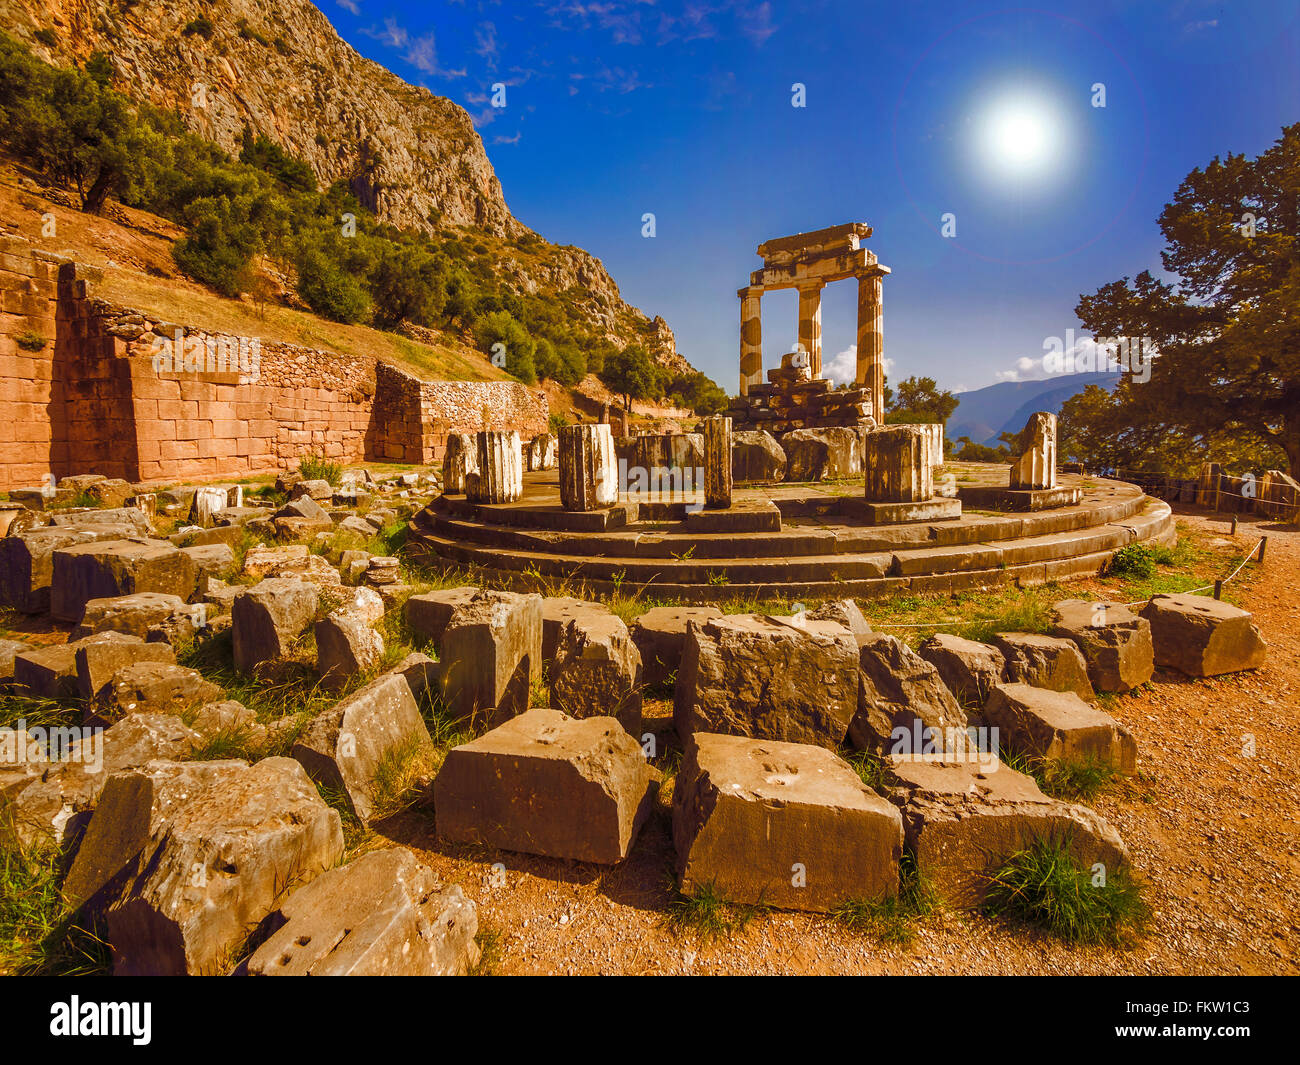 Tholos at the sanctuary of Athena Pronaia, Delphi, Greece. Stock Photo